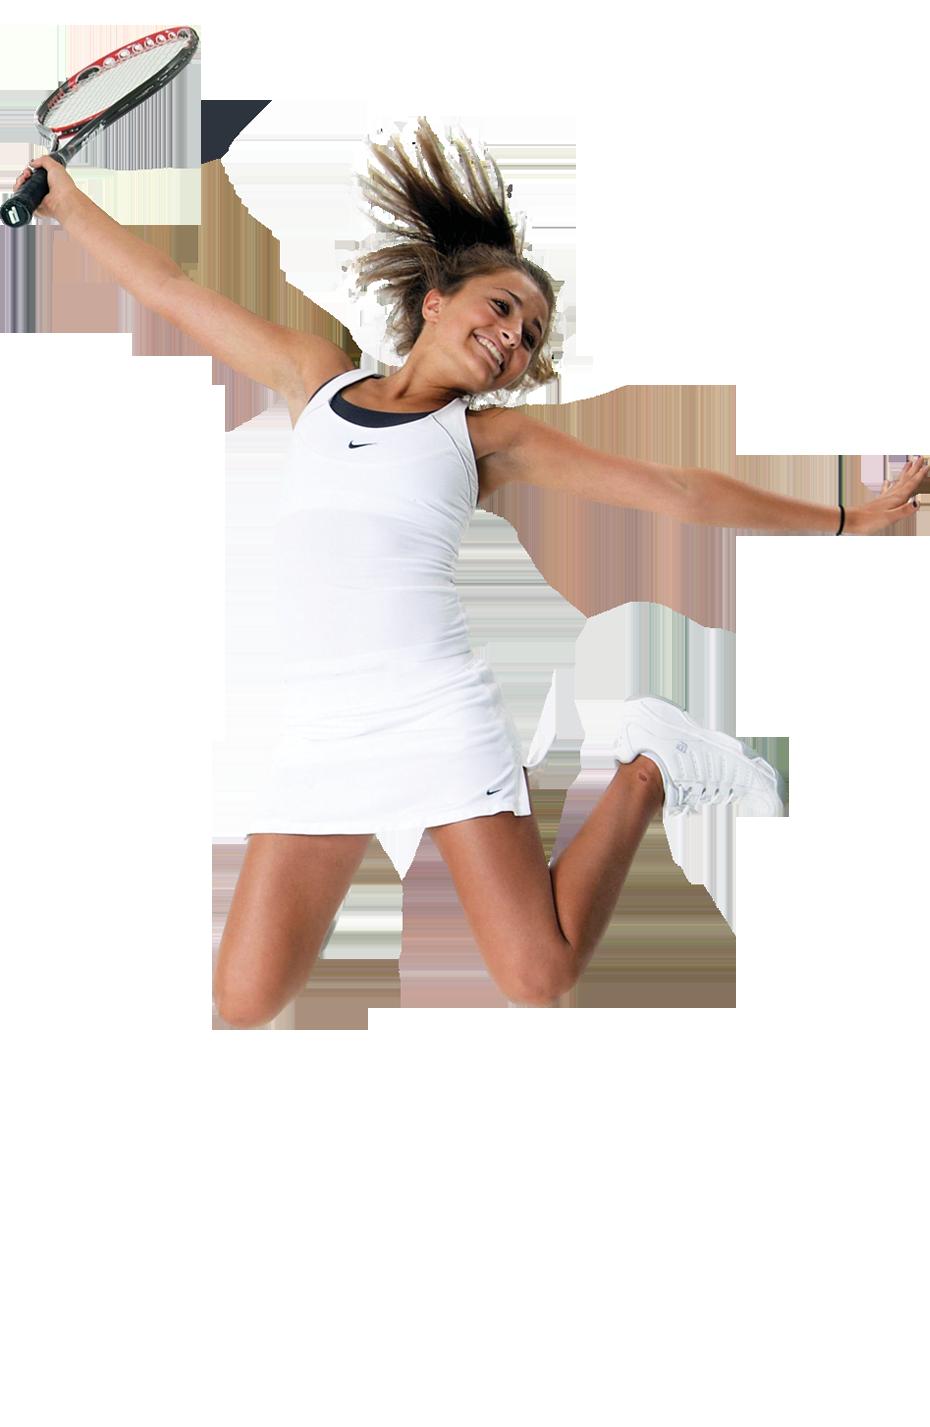 Tennis Png Image Tennis Uniforms Tennis Tennis Players